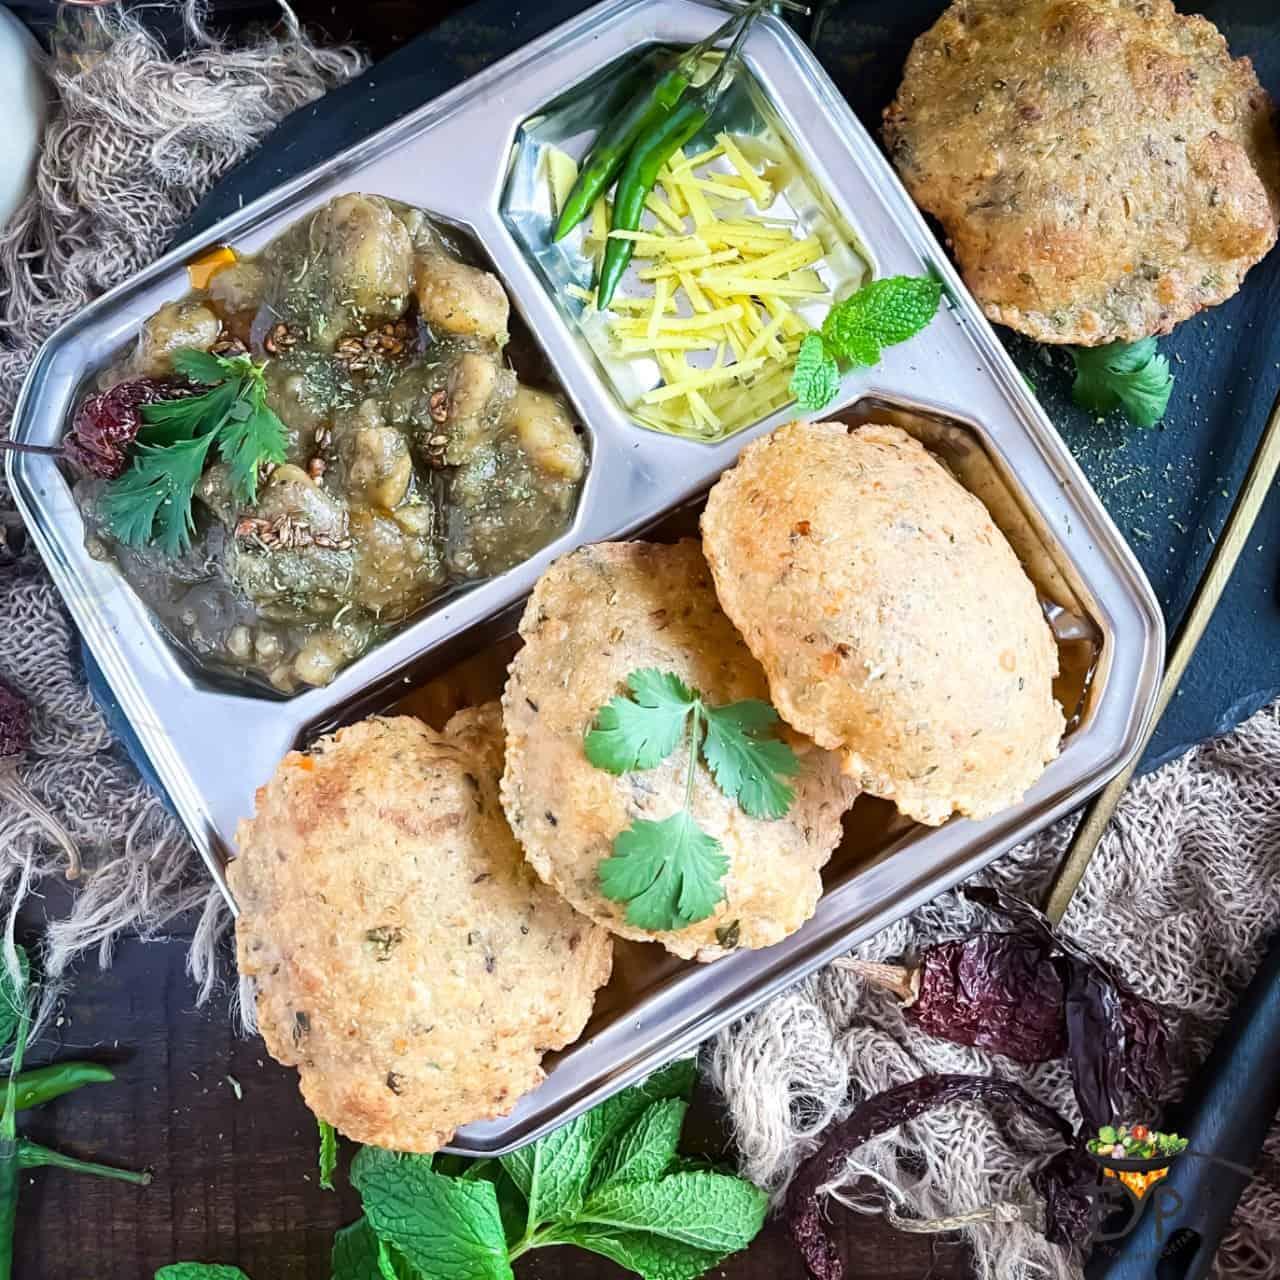 Dubki Wale Aloo: No Onion No Garlic Indian Spicy Potato Curry served with bhedai (deepfried lentil stuffed bread)